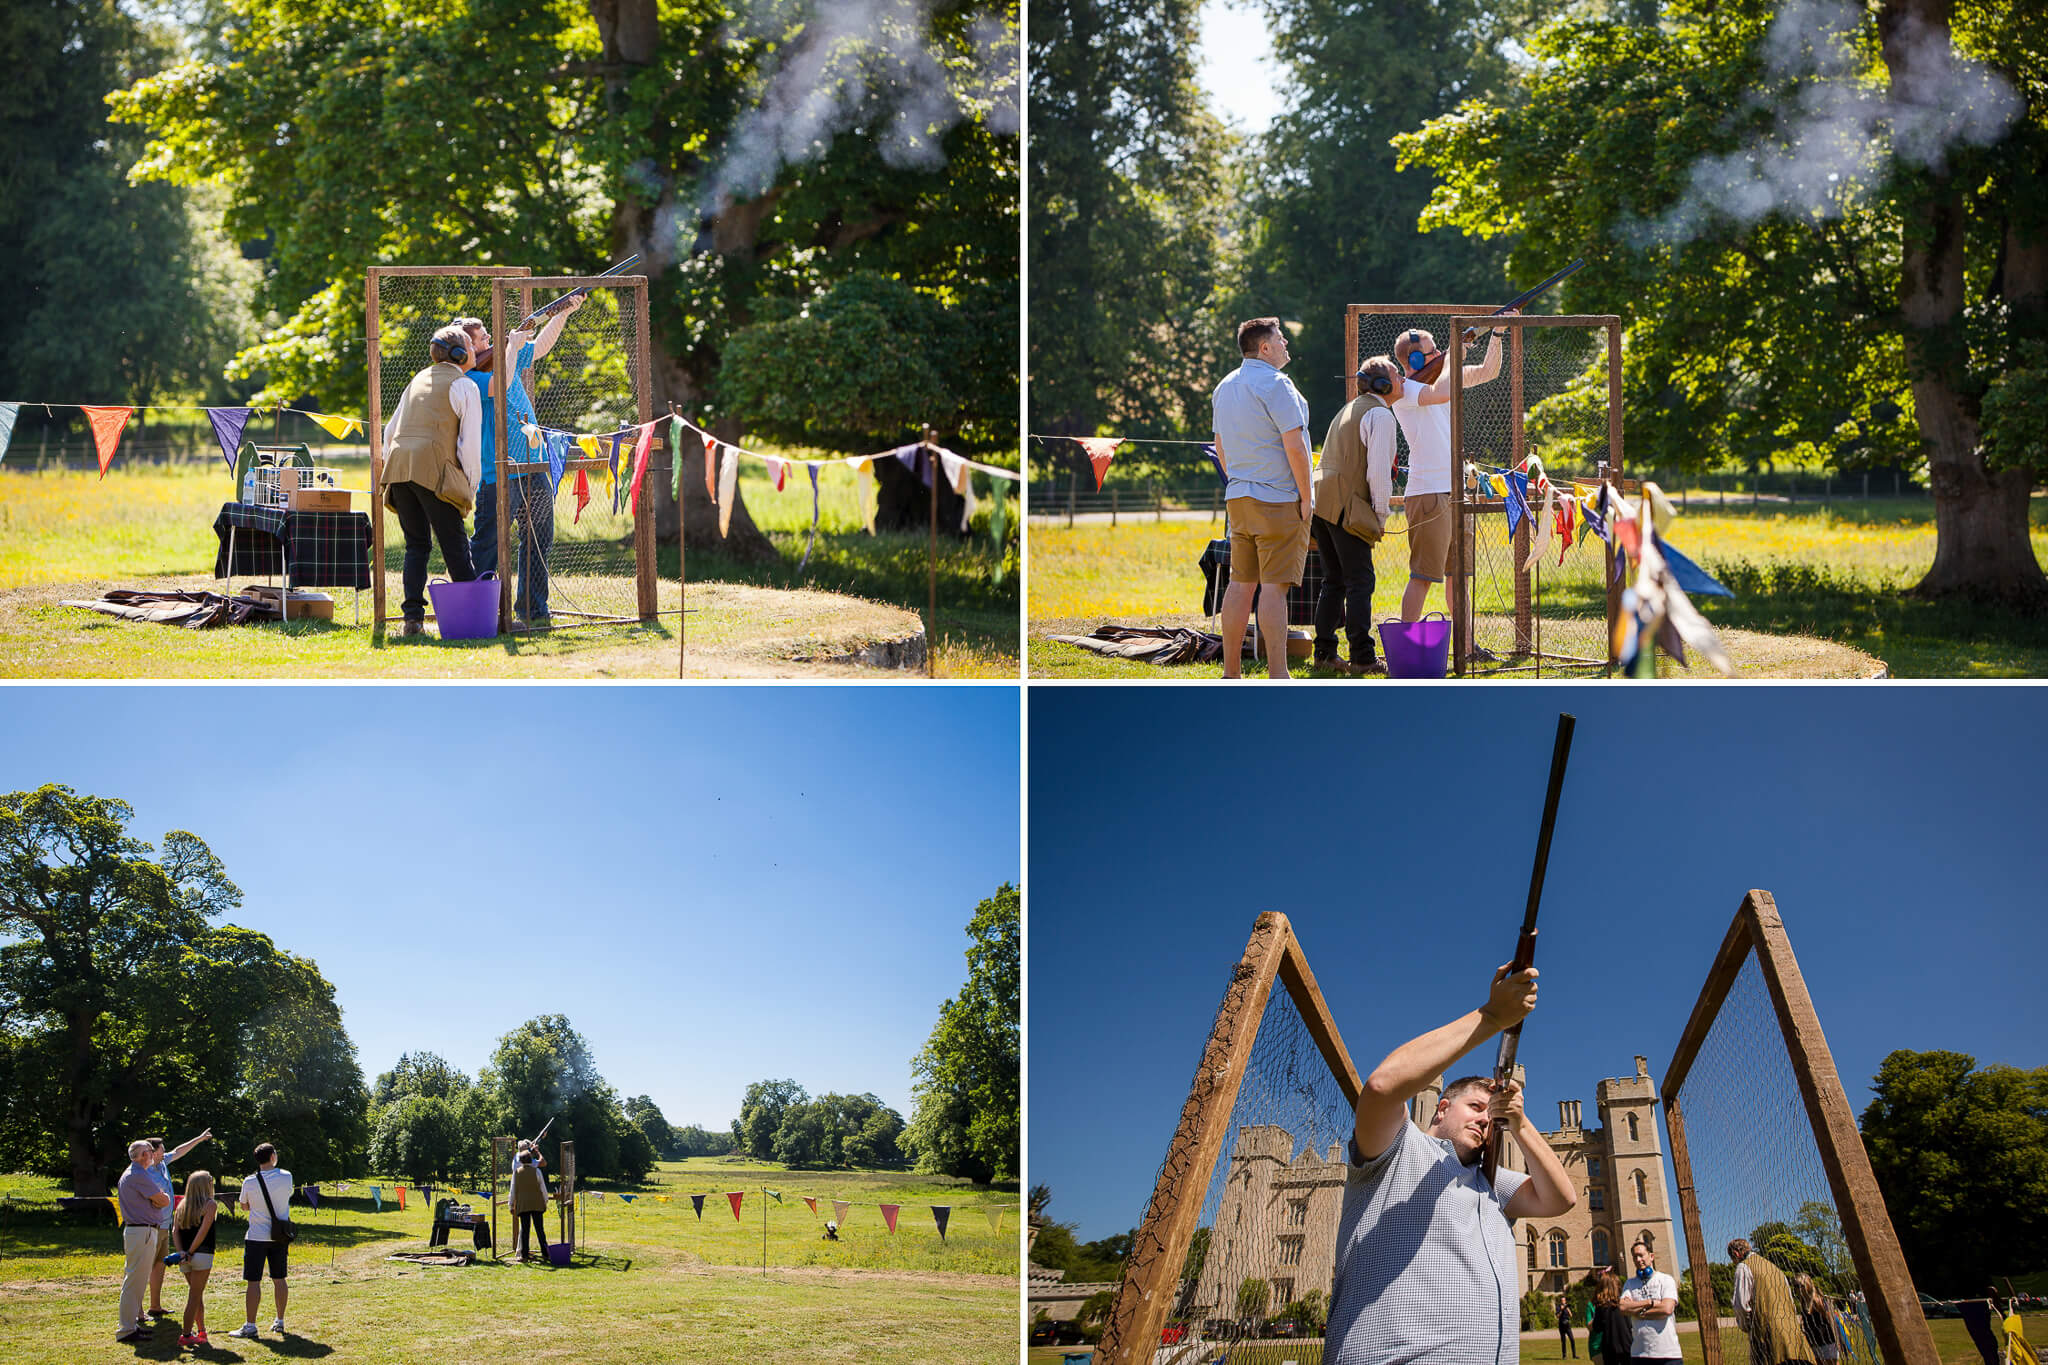 duns-castle-wedding-photograper-scotland-stanbury-photography-007